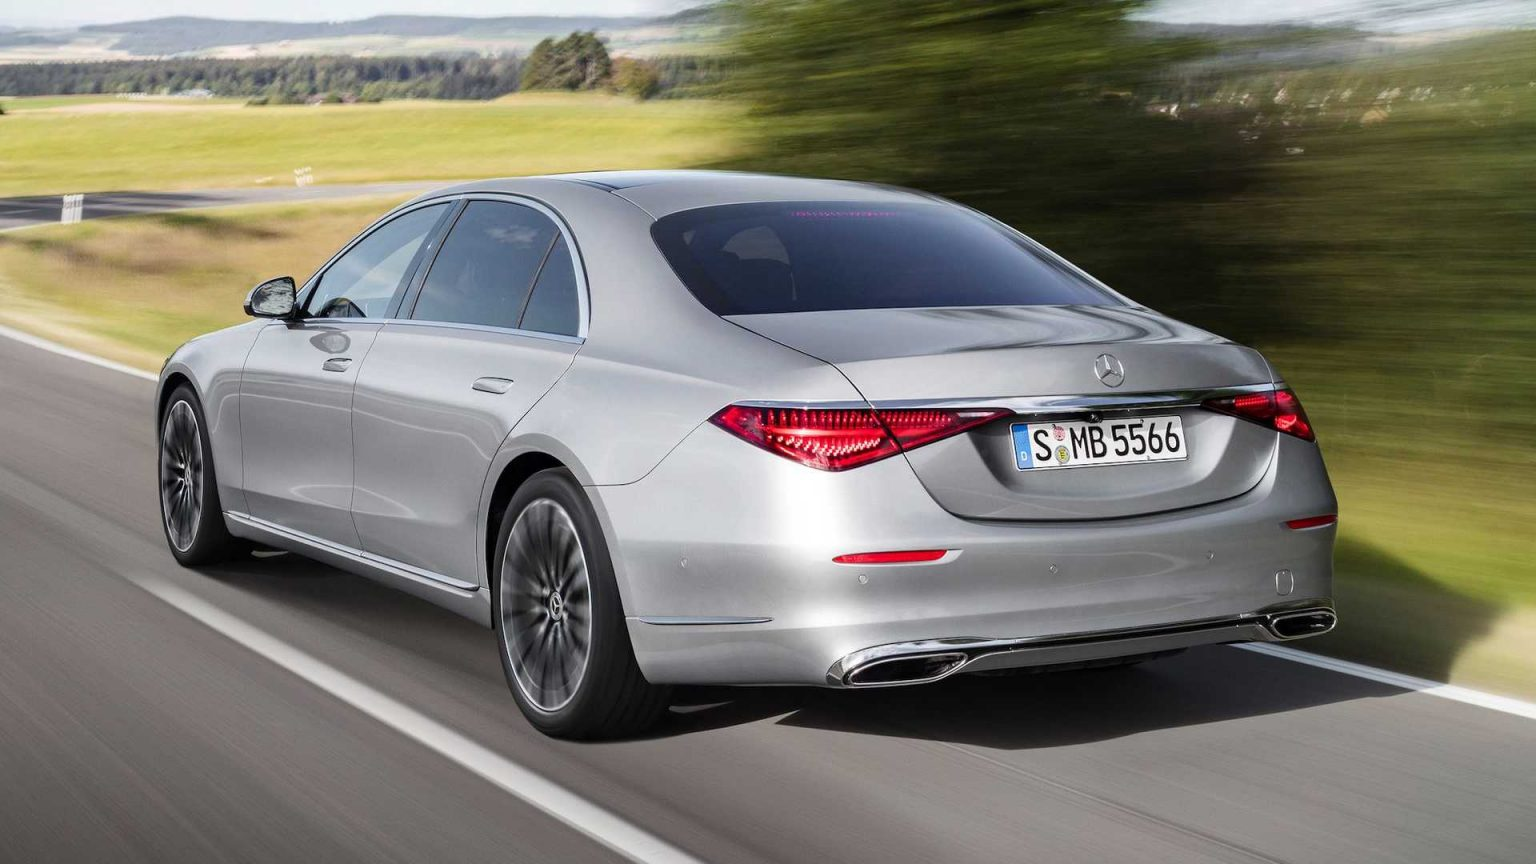 Preview: 2021 Mercedes-Benz S-Class